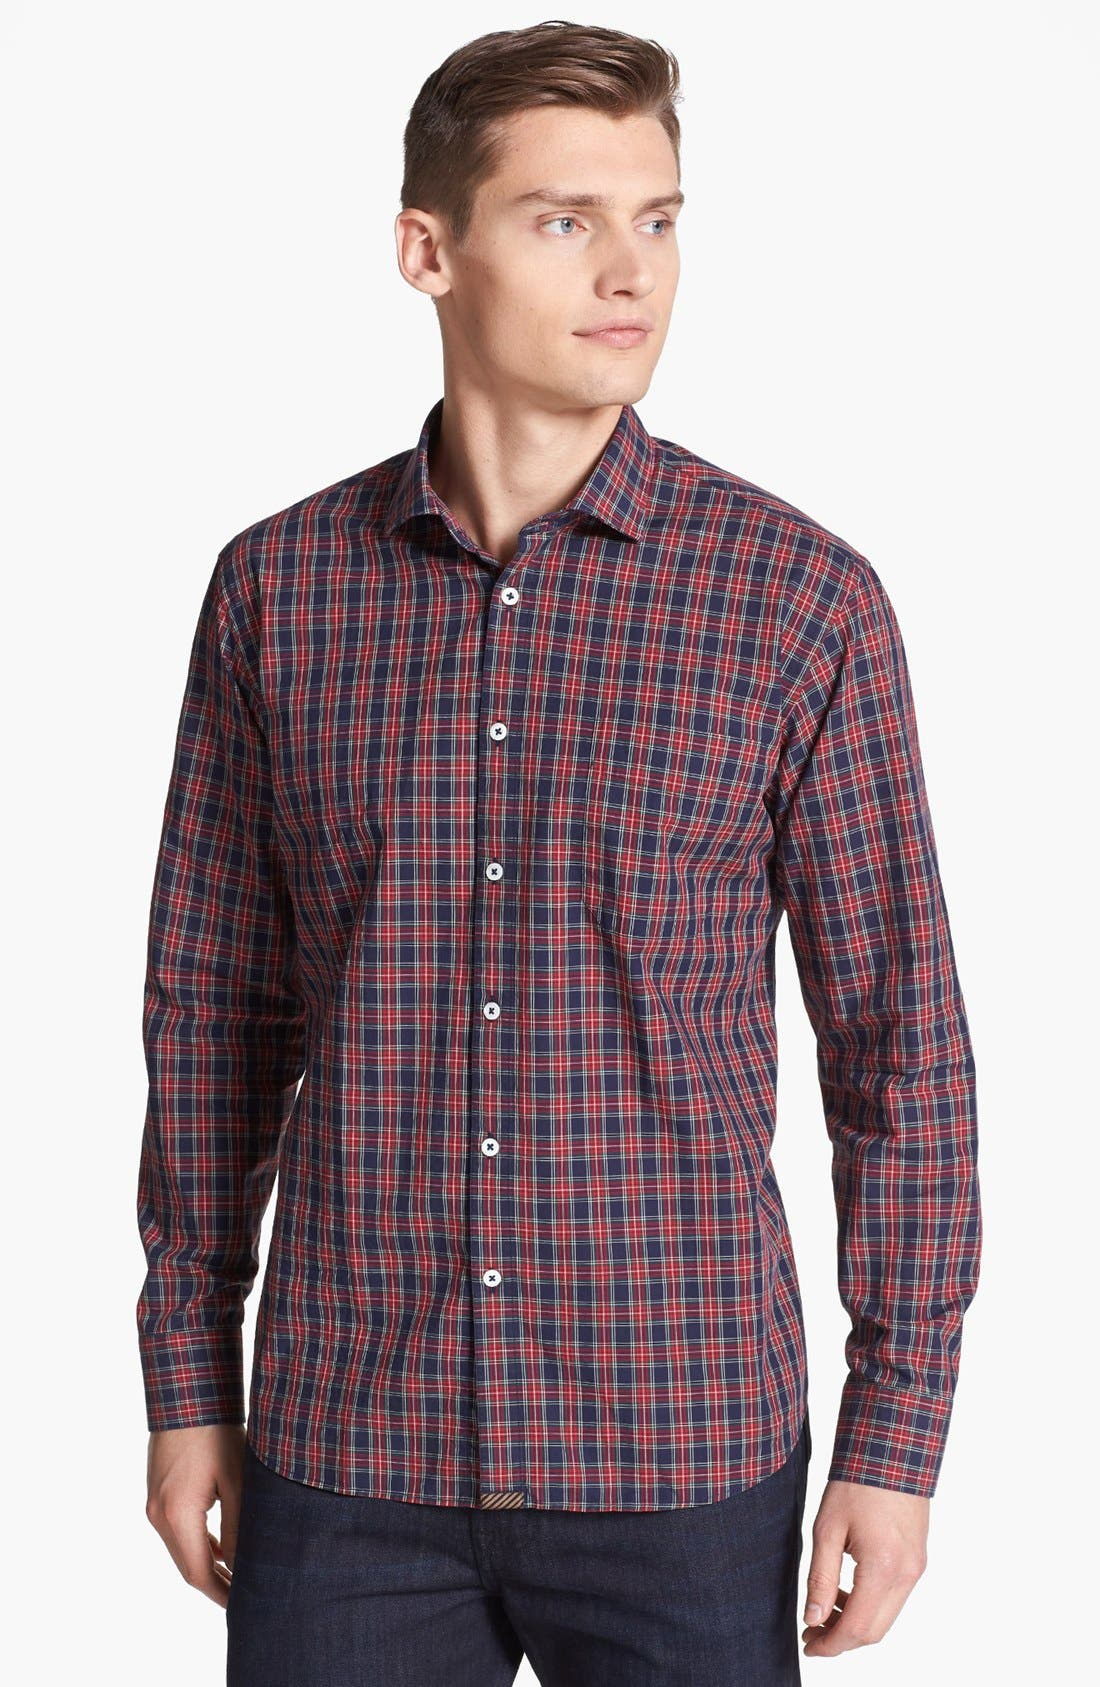 Alternate Image 1 Selected - Billy Reid 'John T' Plaid Woven Shirt